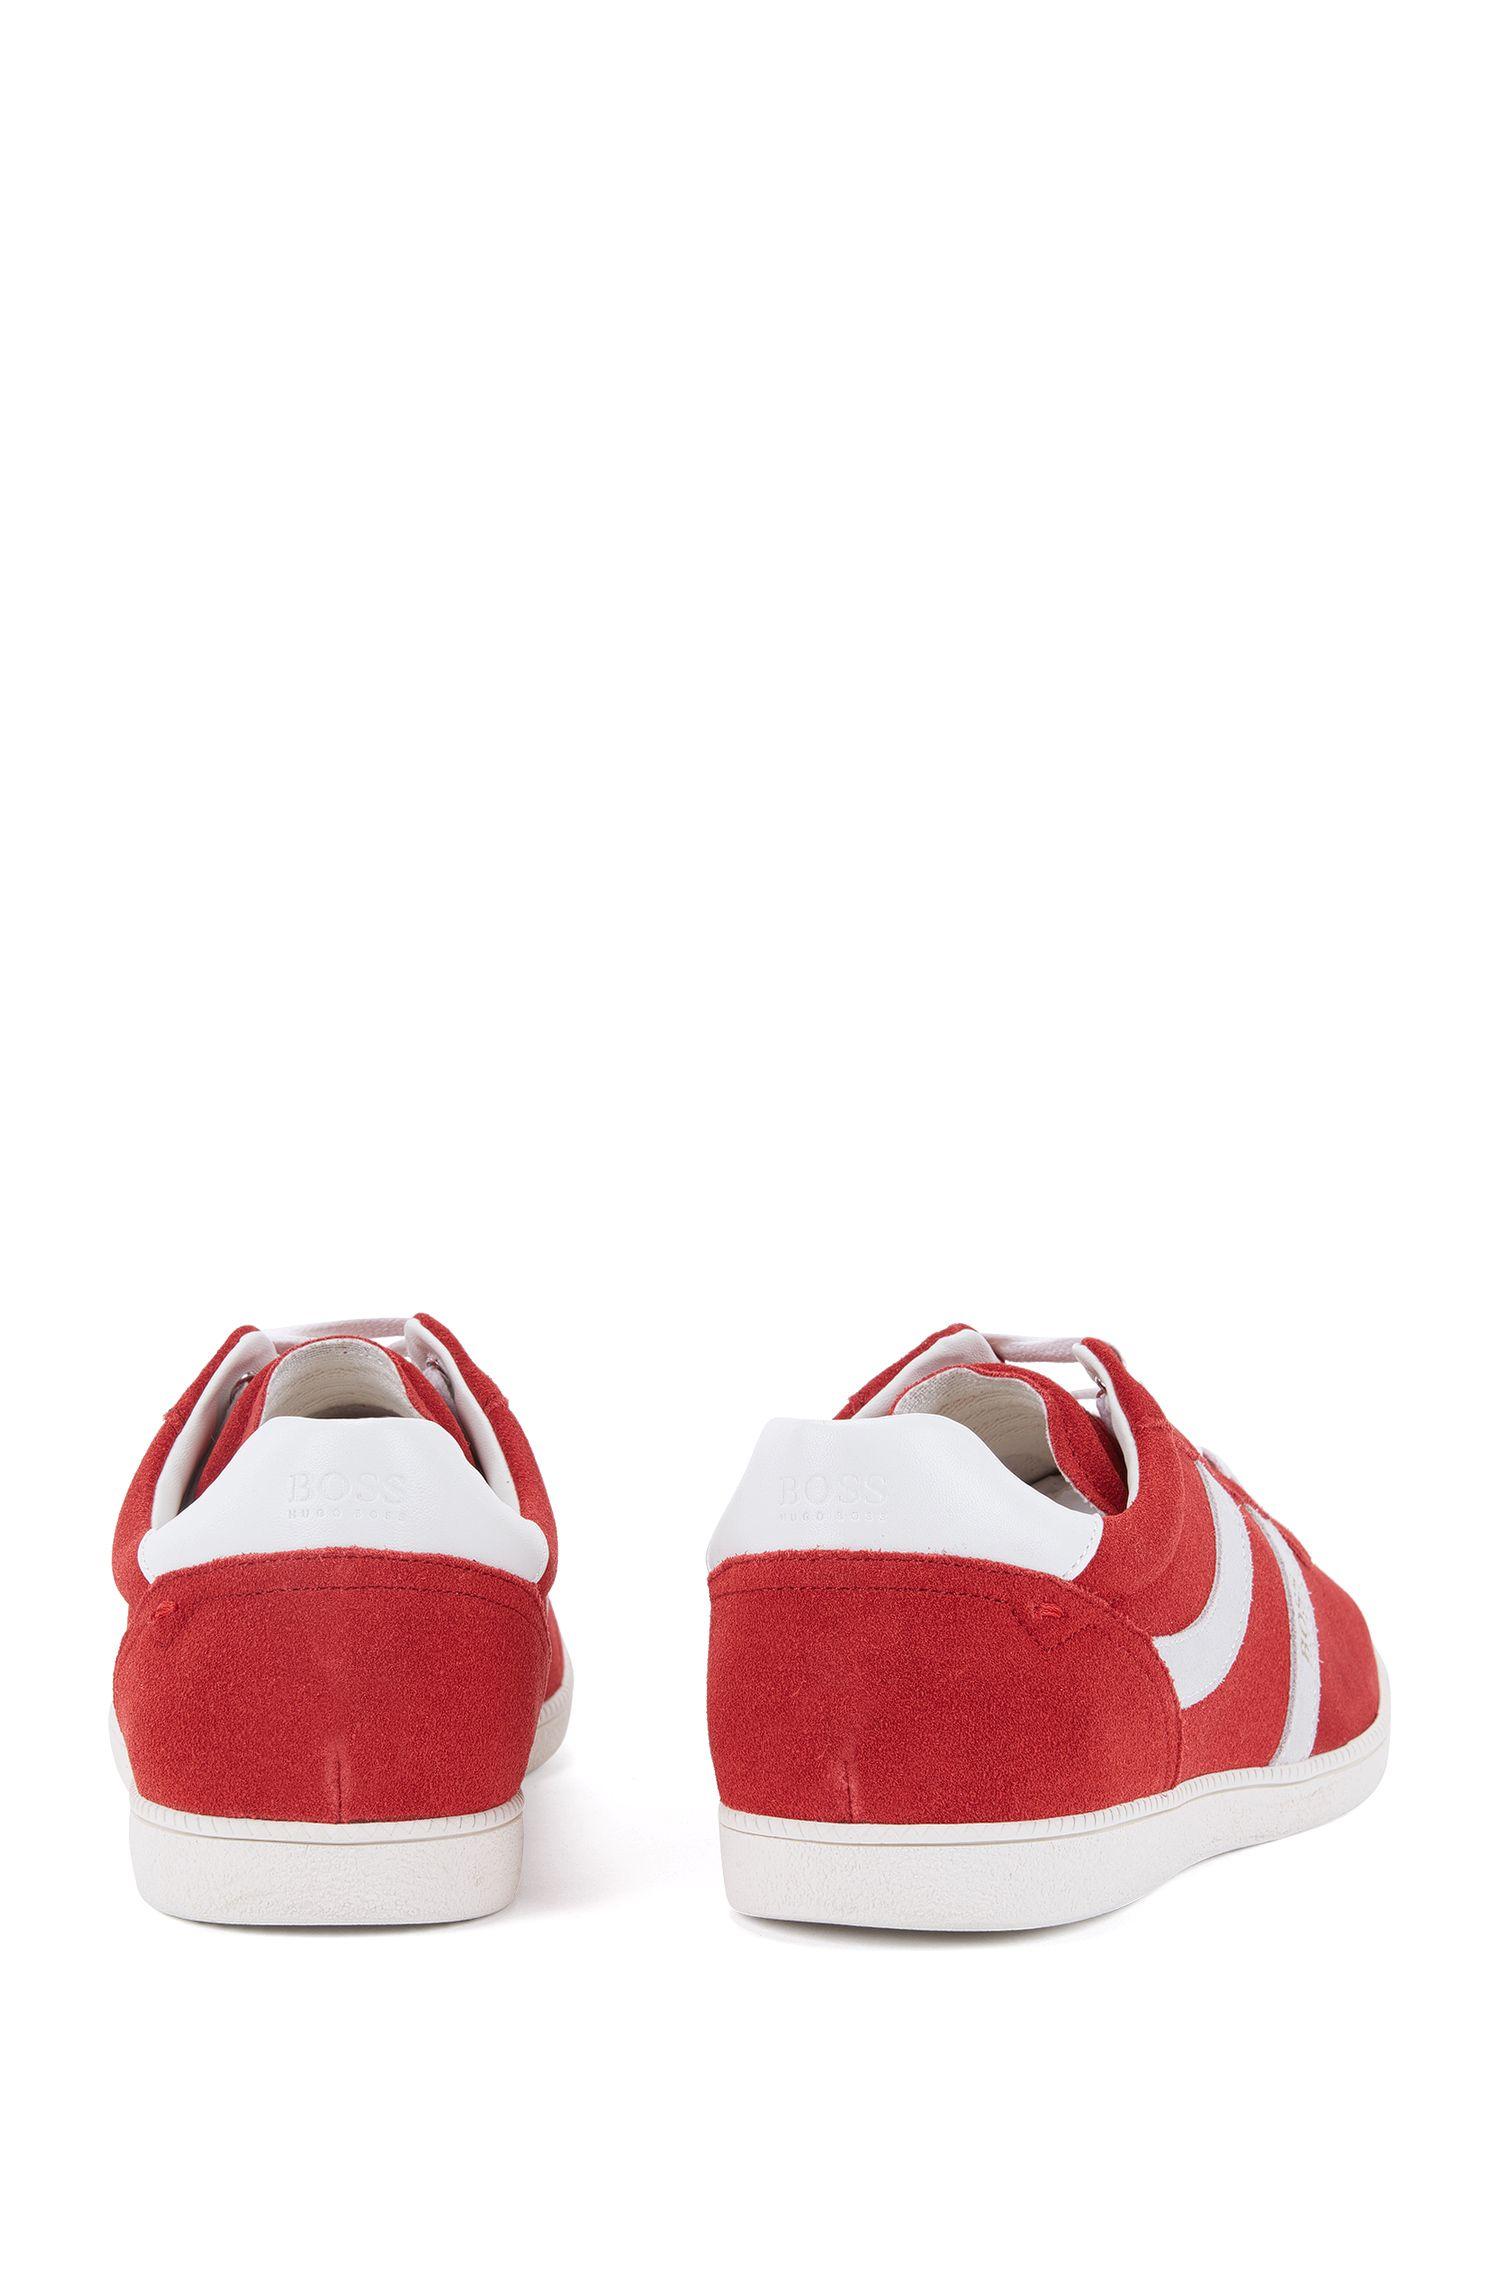 Suede Sneaker | Rumba Tenn Sd, Red